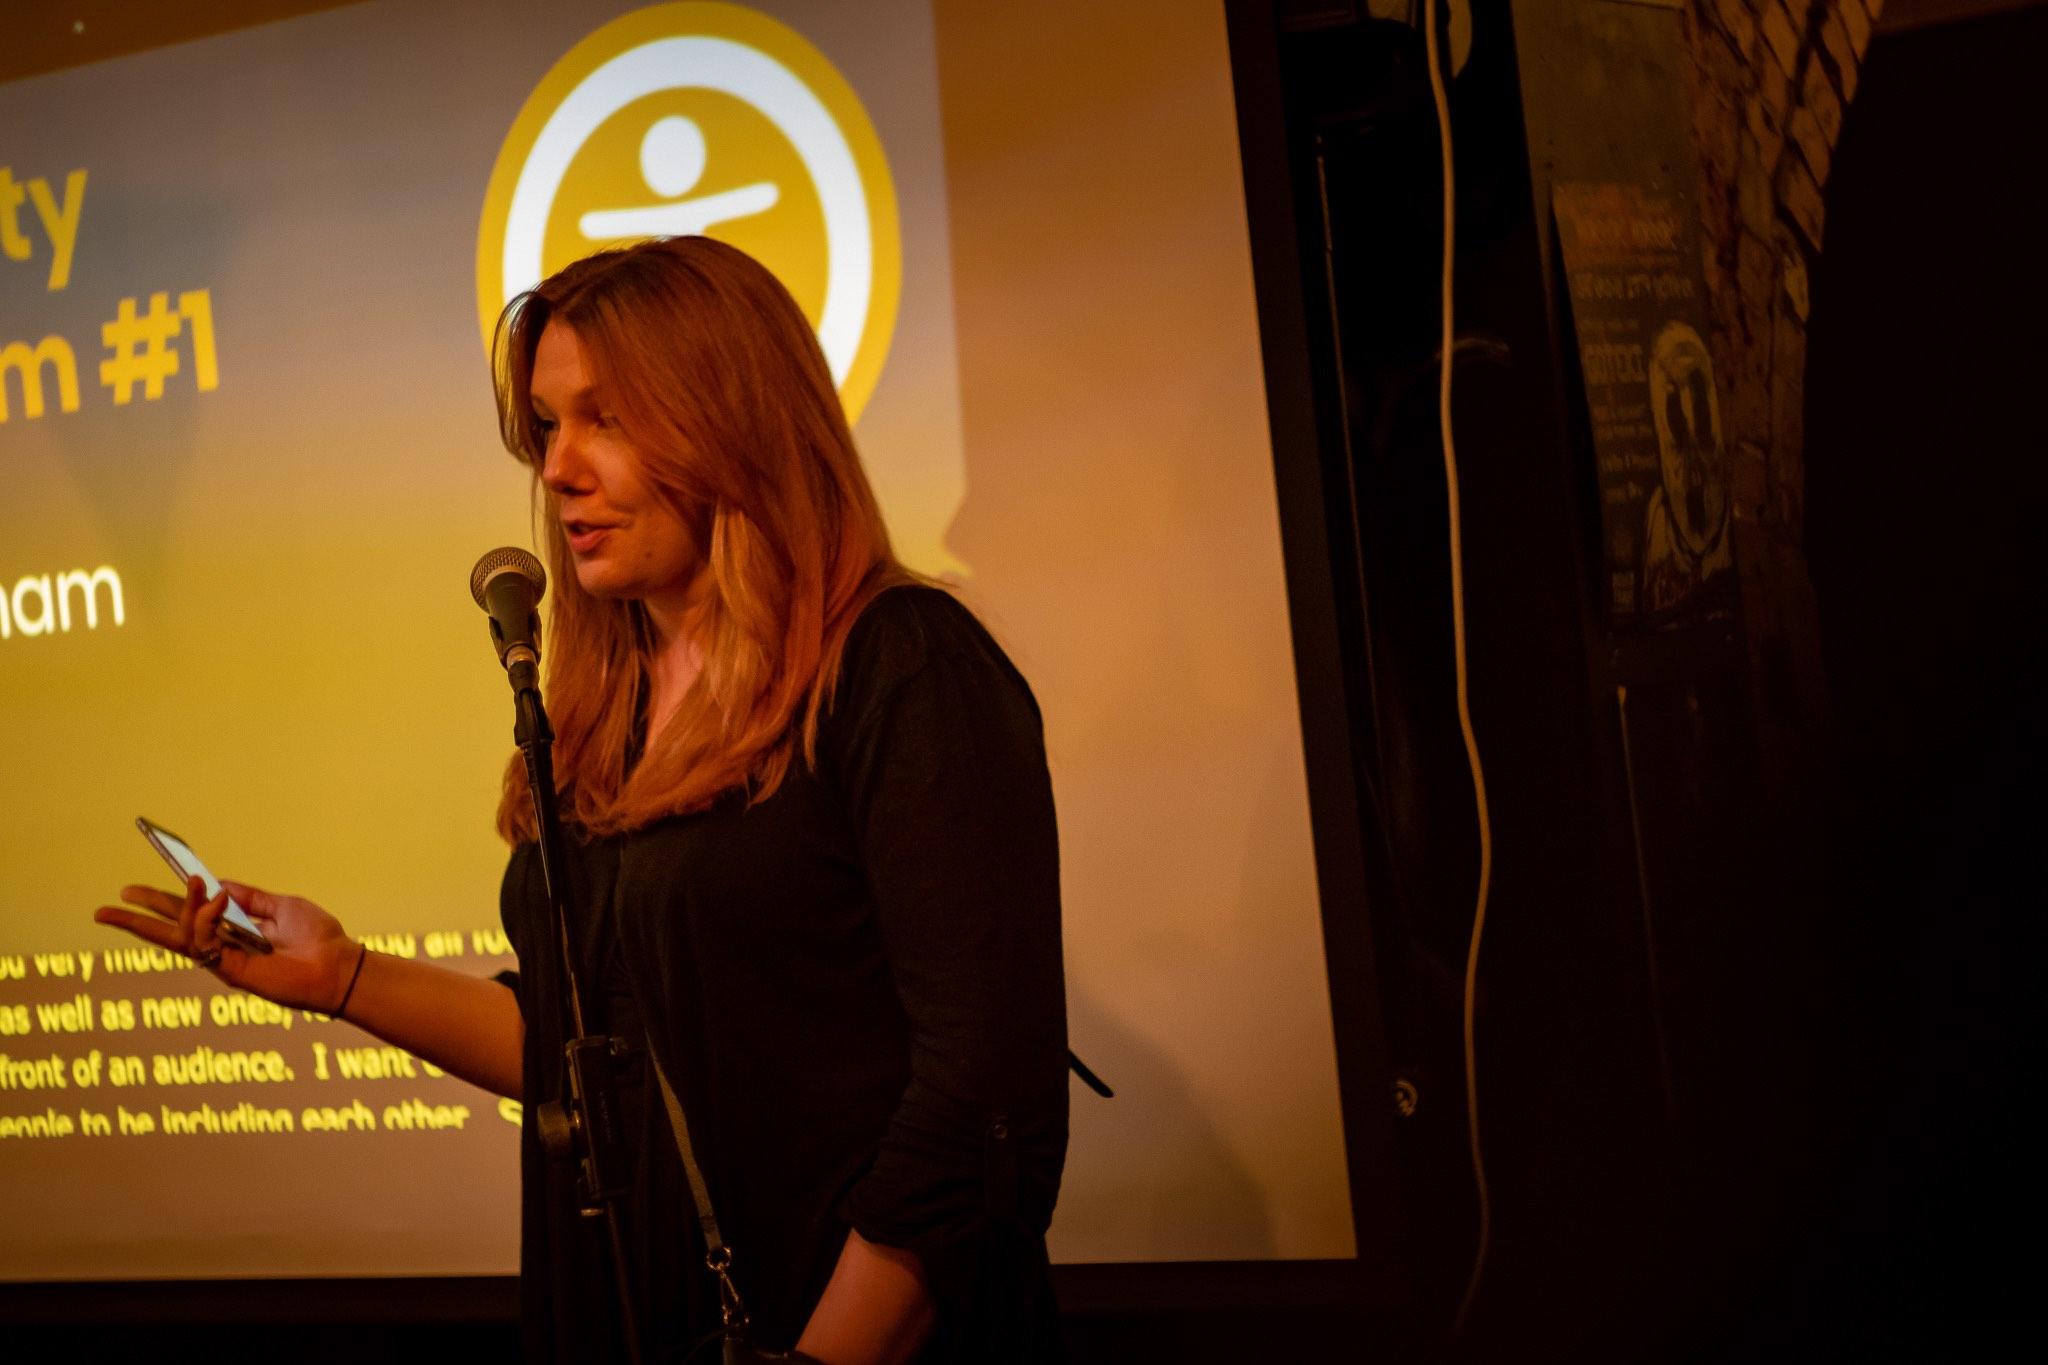 Zara Gemmell, a speaker at the event, giving a presentation.